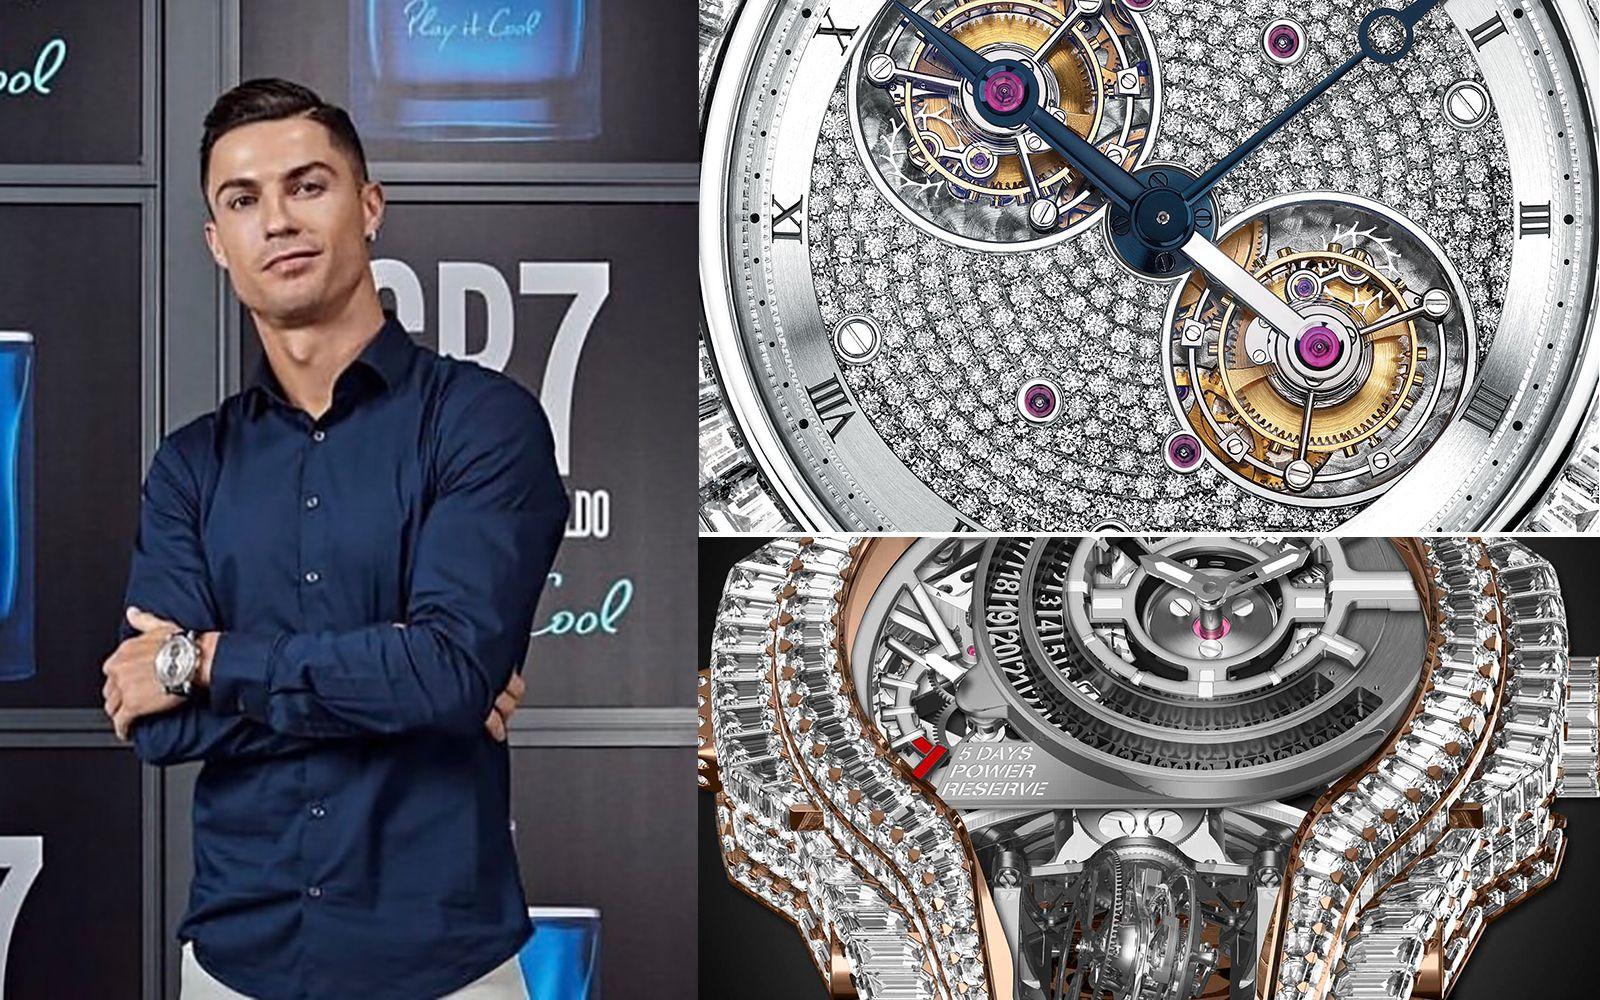 Tatler Treasures:C羅的錶盒大直擊!滿鑽、訂製款、超複雜功能,最懂錶的球星非他莫屬!